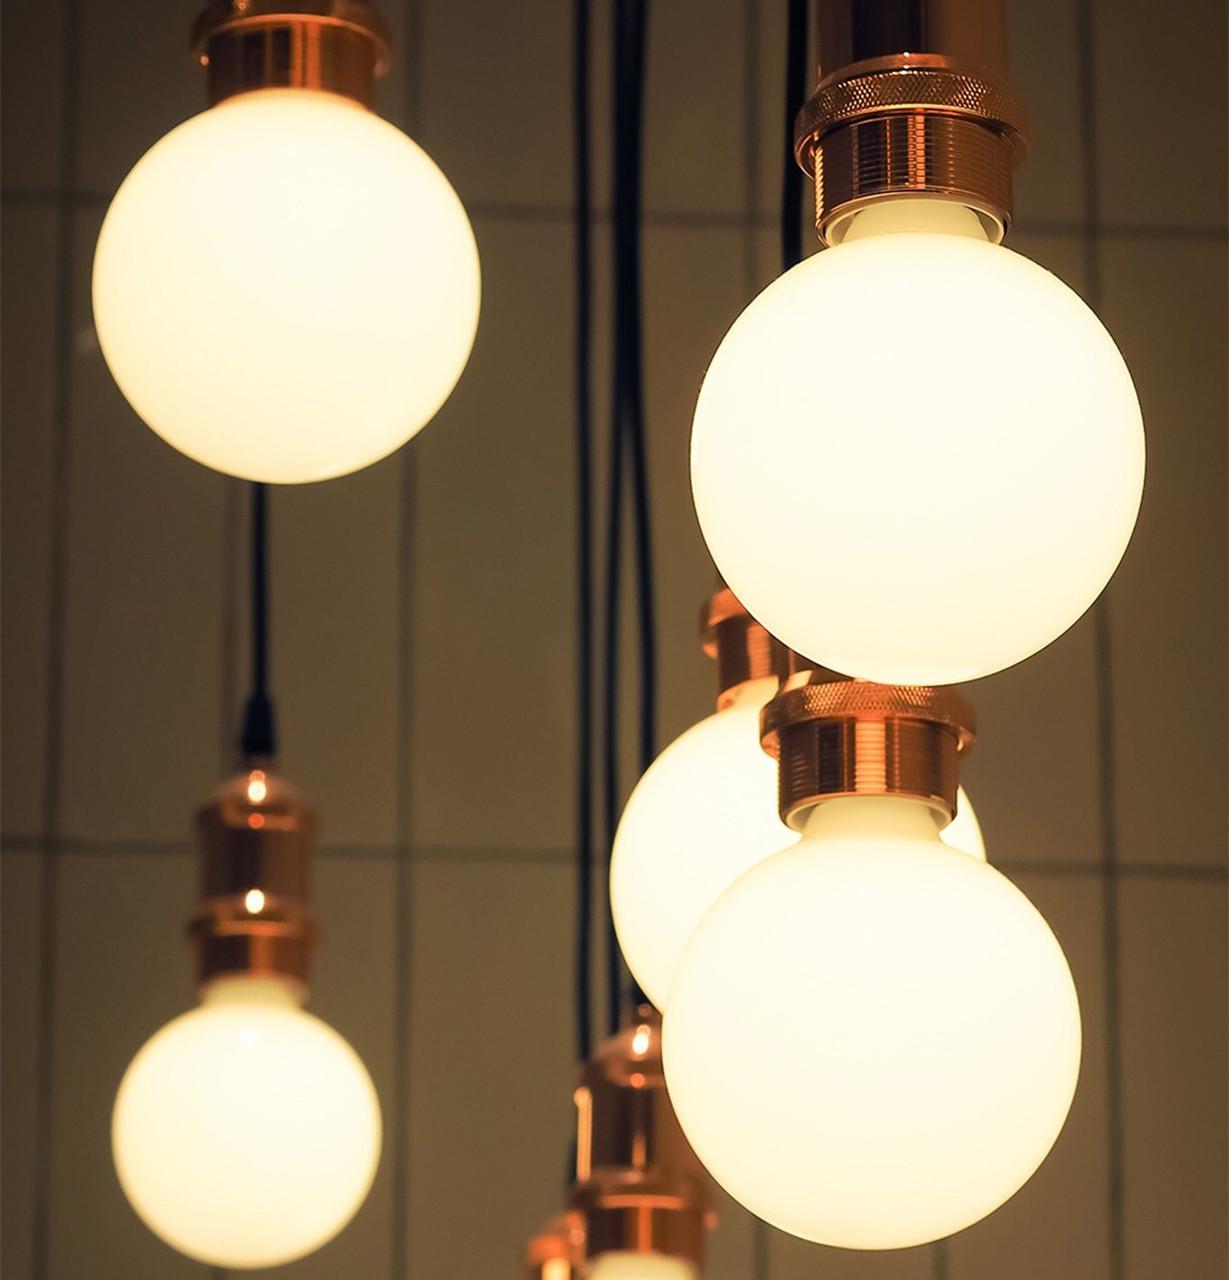 LED G95 Antique Bronze Light Bulbs